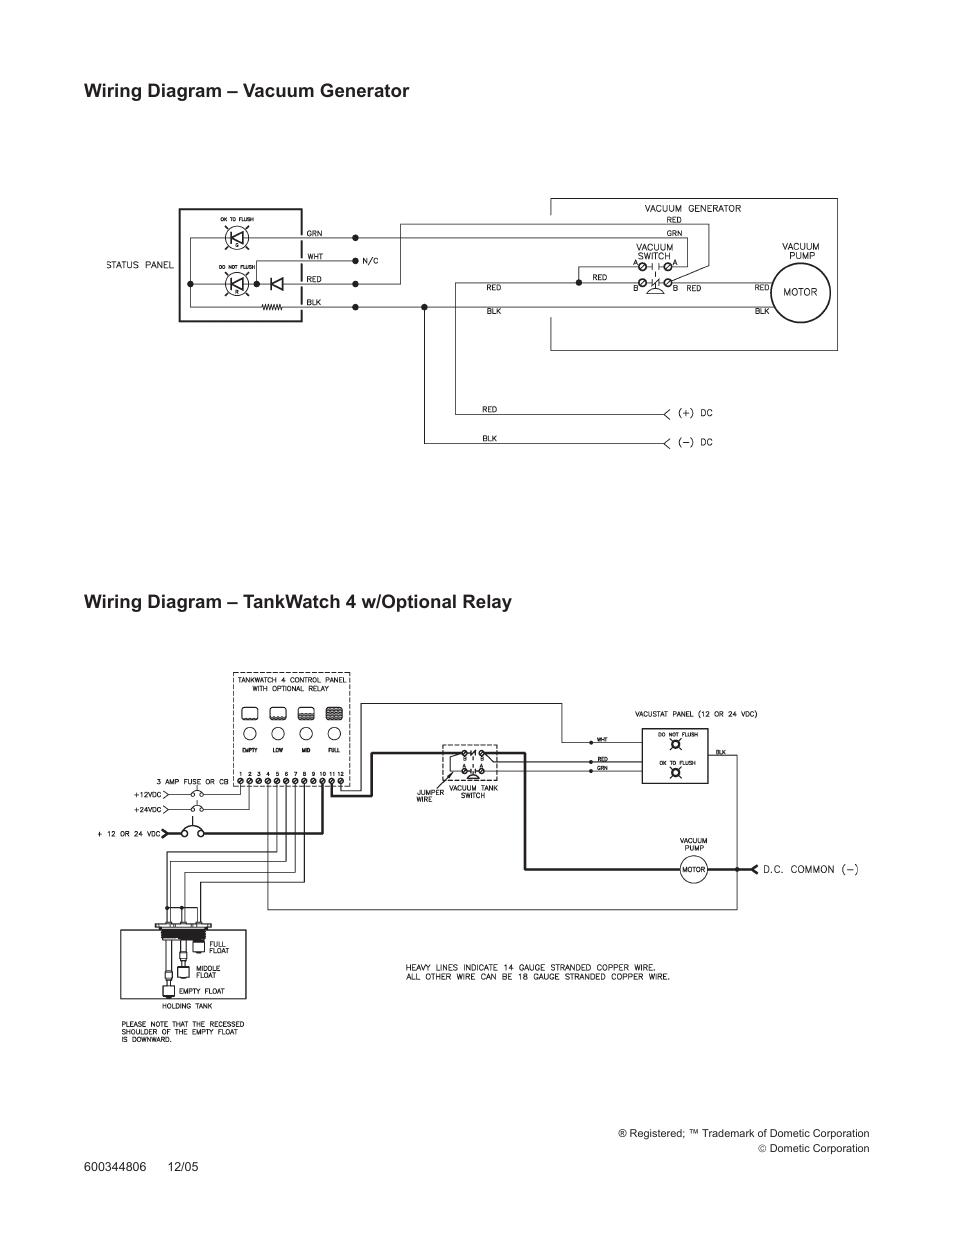 hight resolution of gewiss wiring instructions wiring diagram todaywiring diagram vacuum generator wiring diagram tankwatch 4 w gewiss